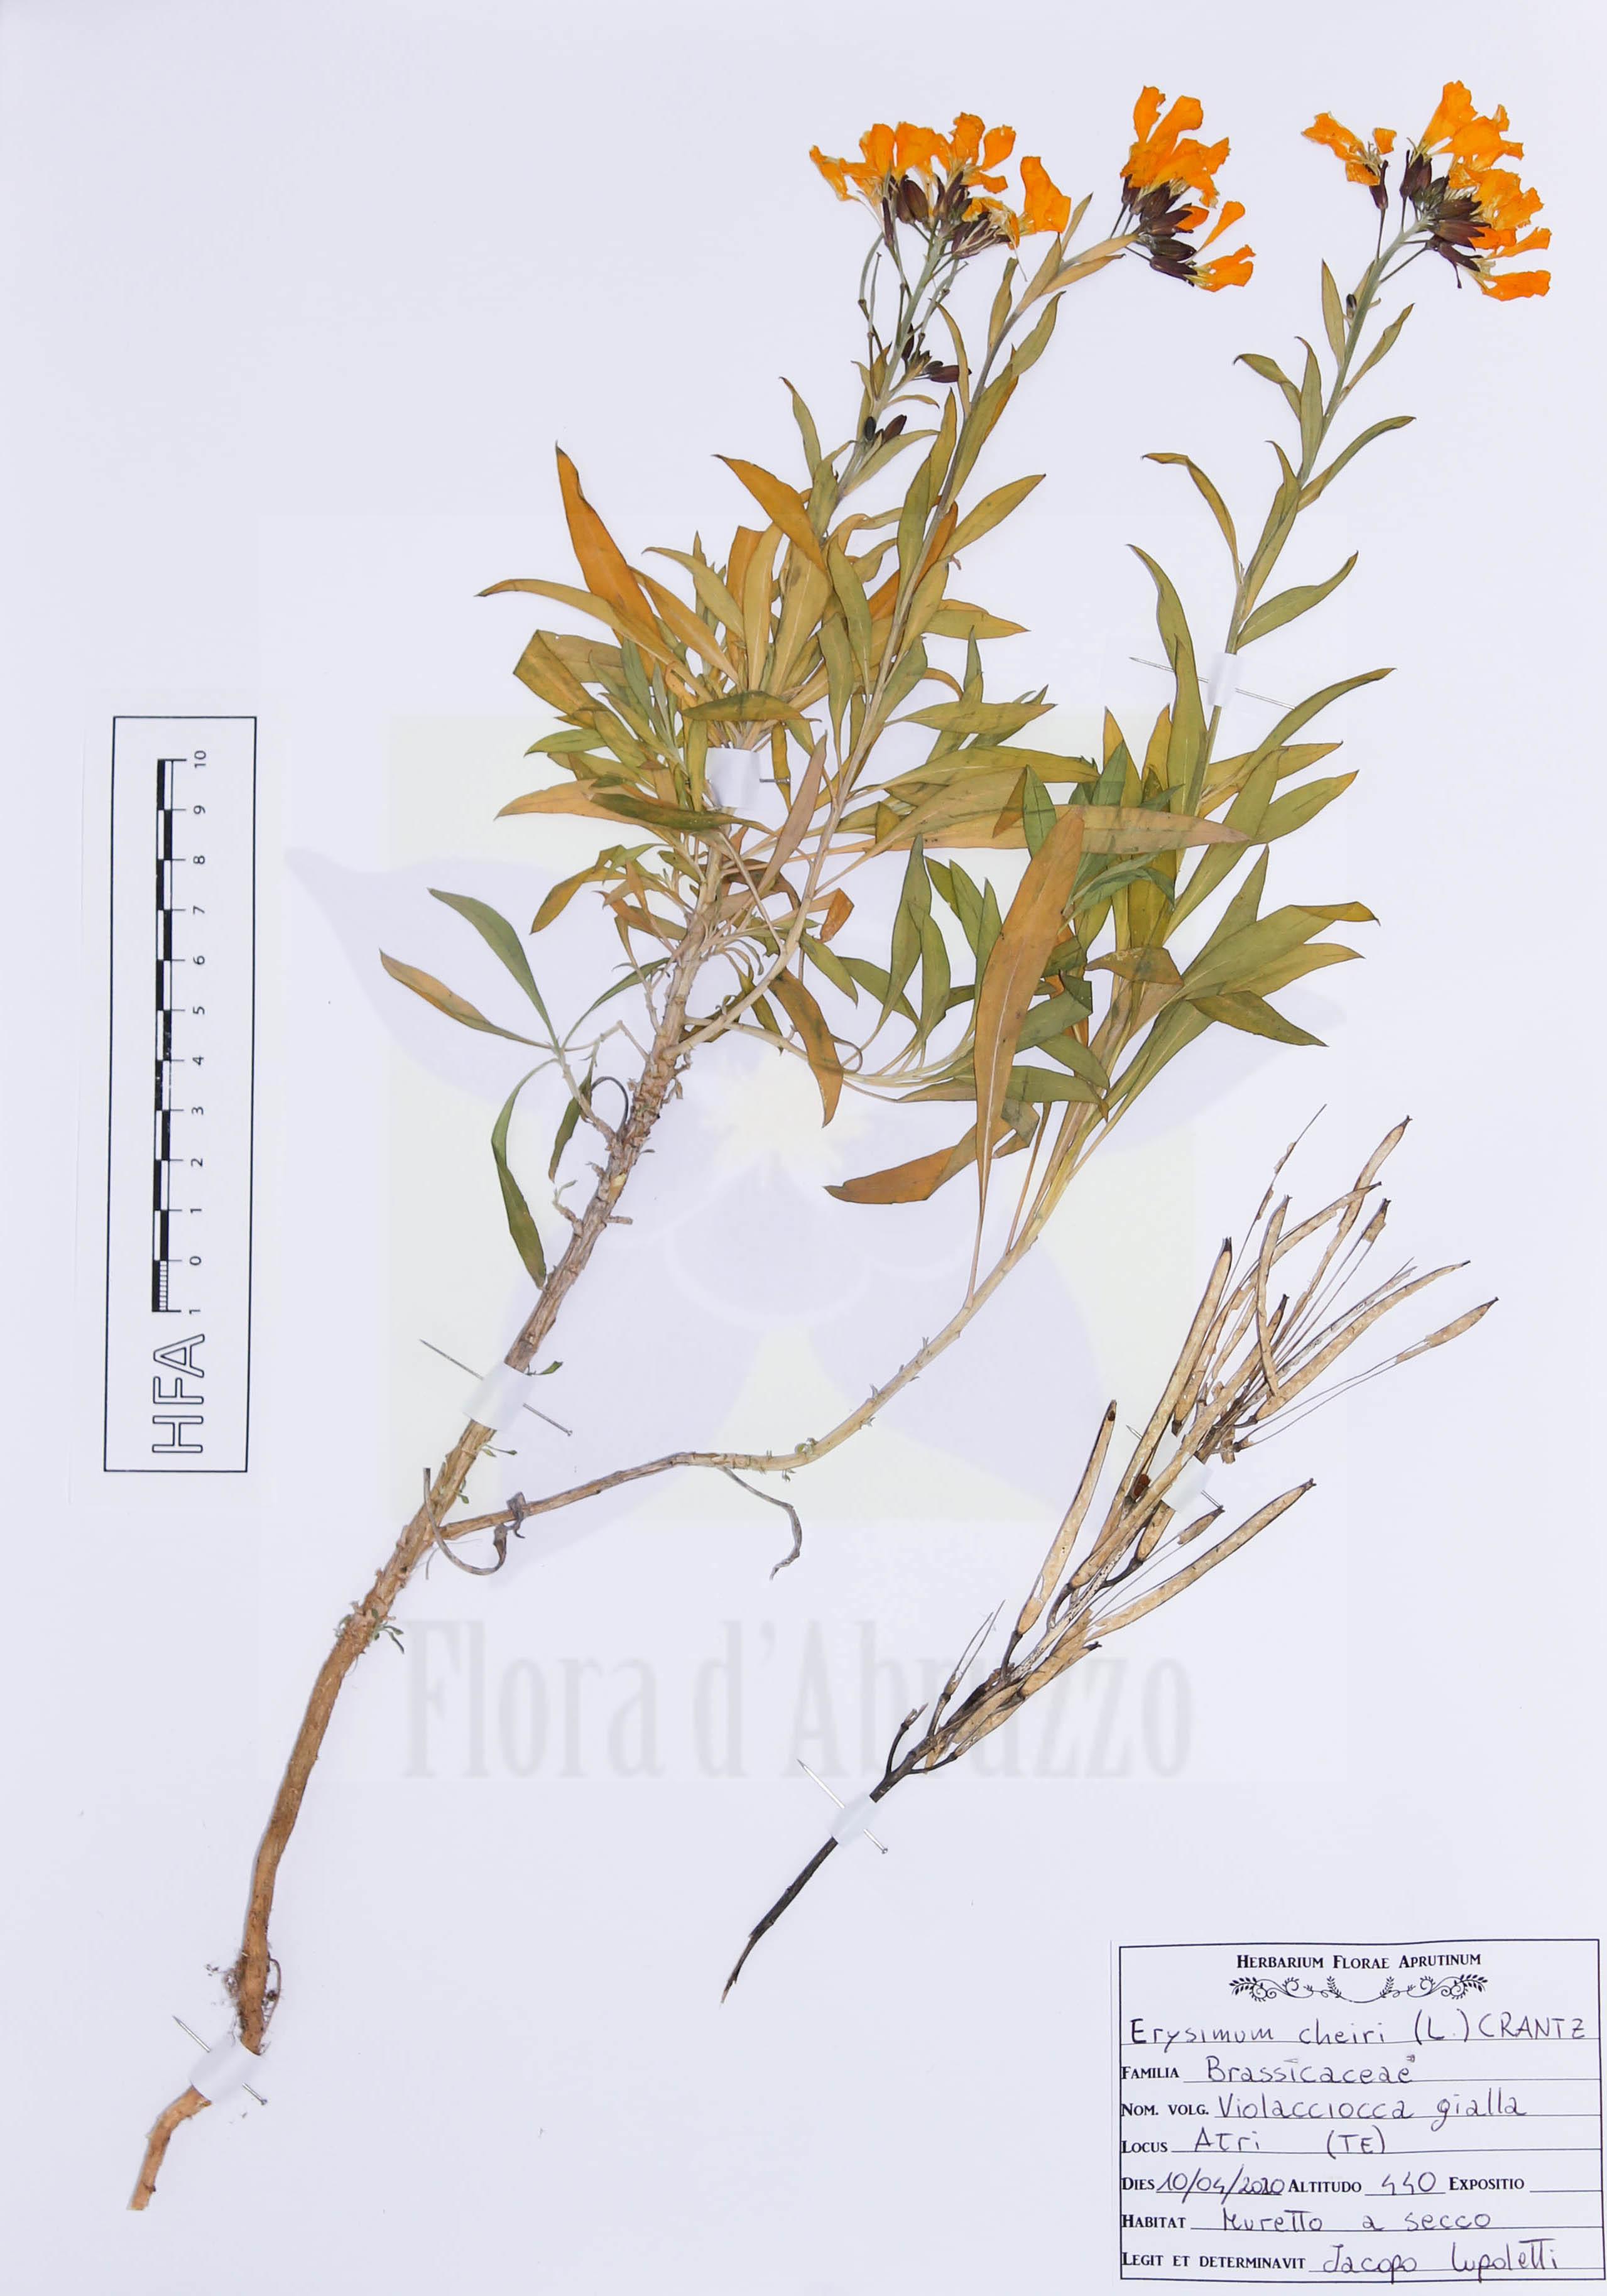 Erysimum cheiri(L.) Crantz